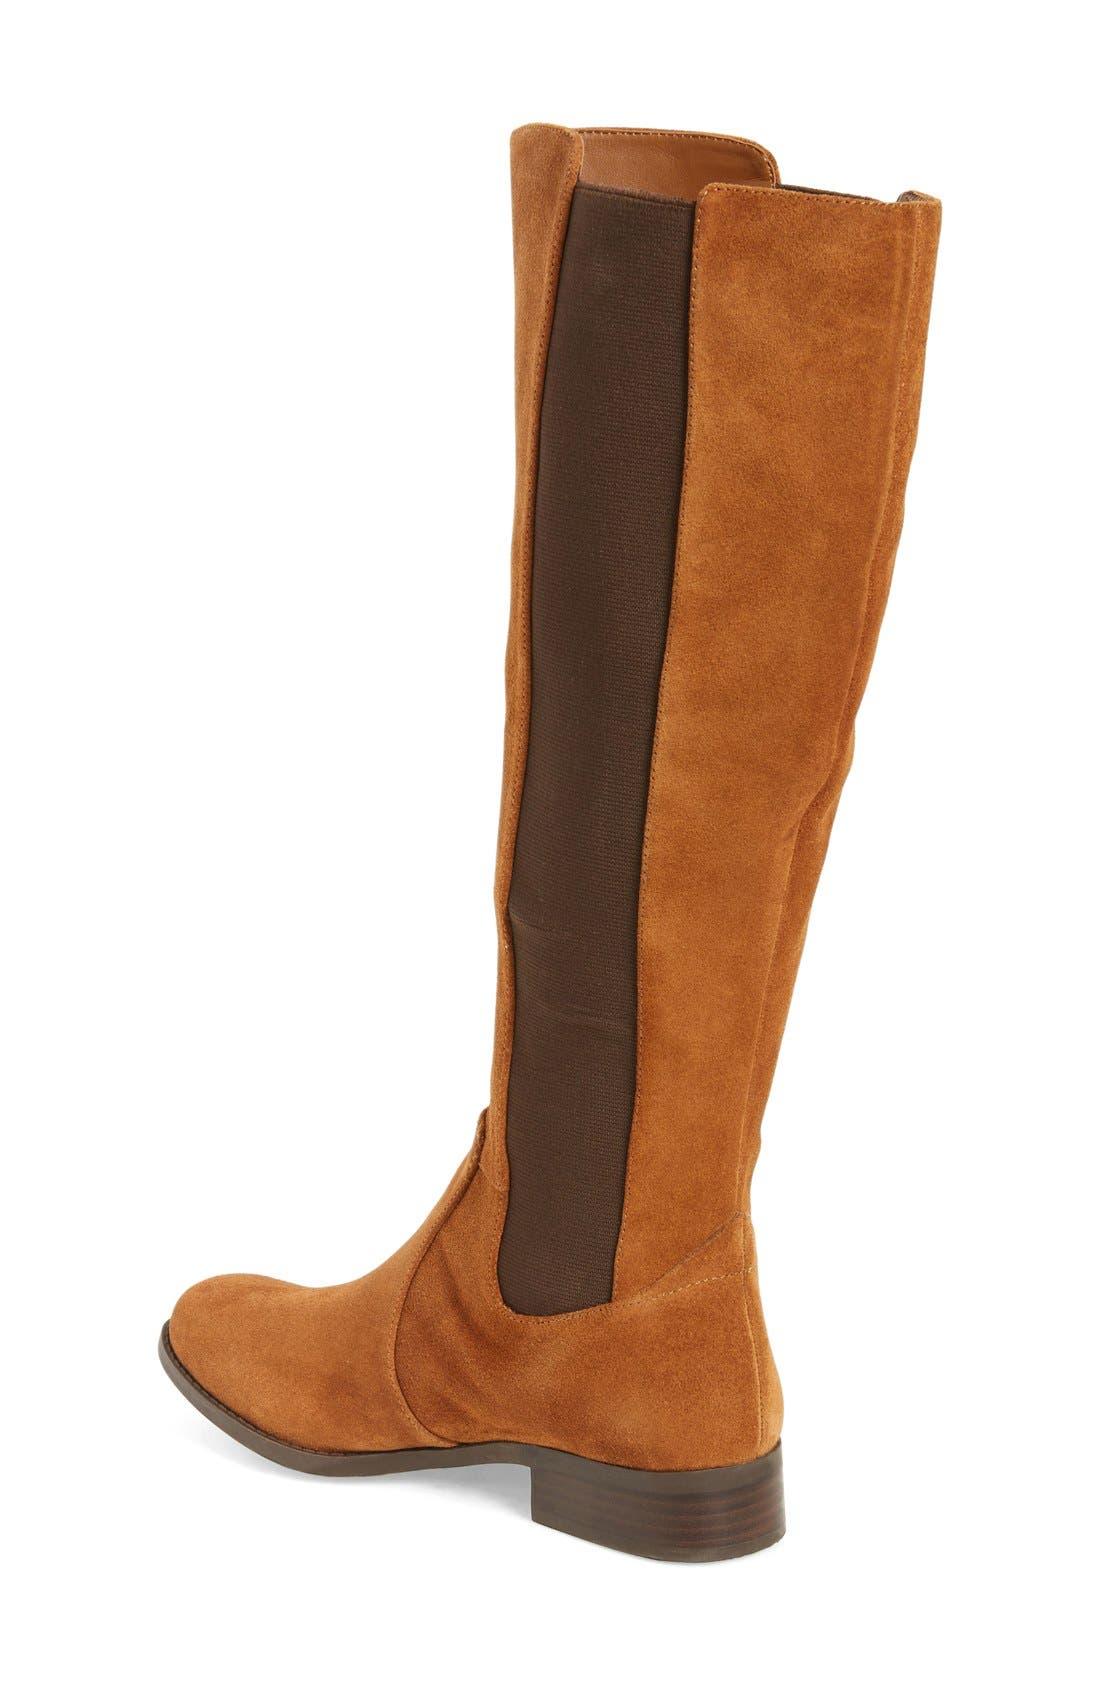 Alternate Image 2  - Jessica Simpson 'Ricel' Riding Boot (Women) (Regular & Wide Calf)